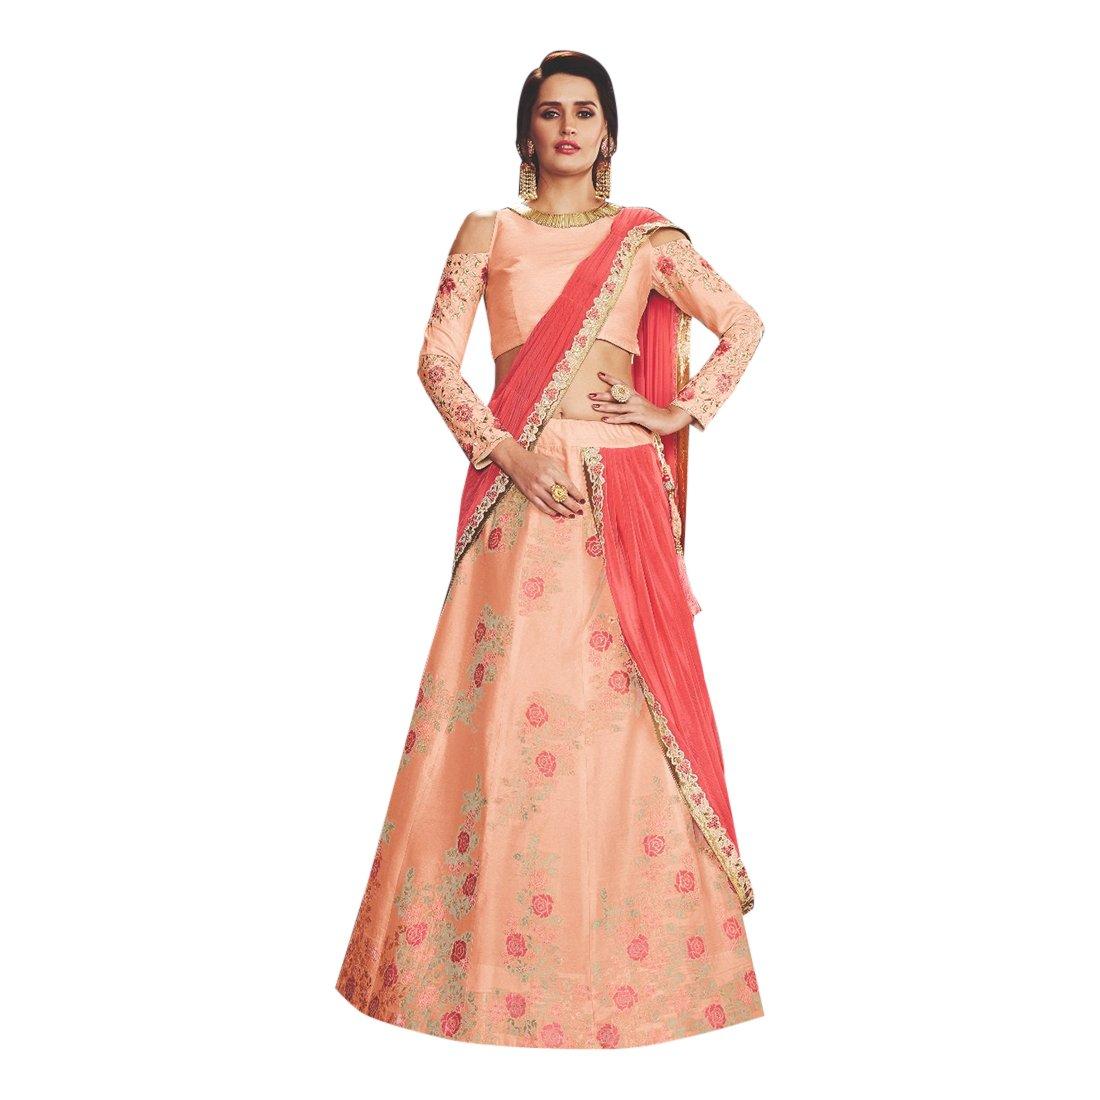 New Arrival Wedding Bollywood Designer Stylish Lehenga Choli Dupatta Custom to Measure Muslim Eid 2521 by ETHNIC EMPORIUM (Image #1)